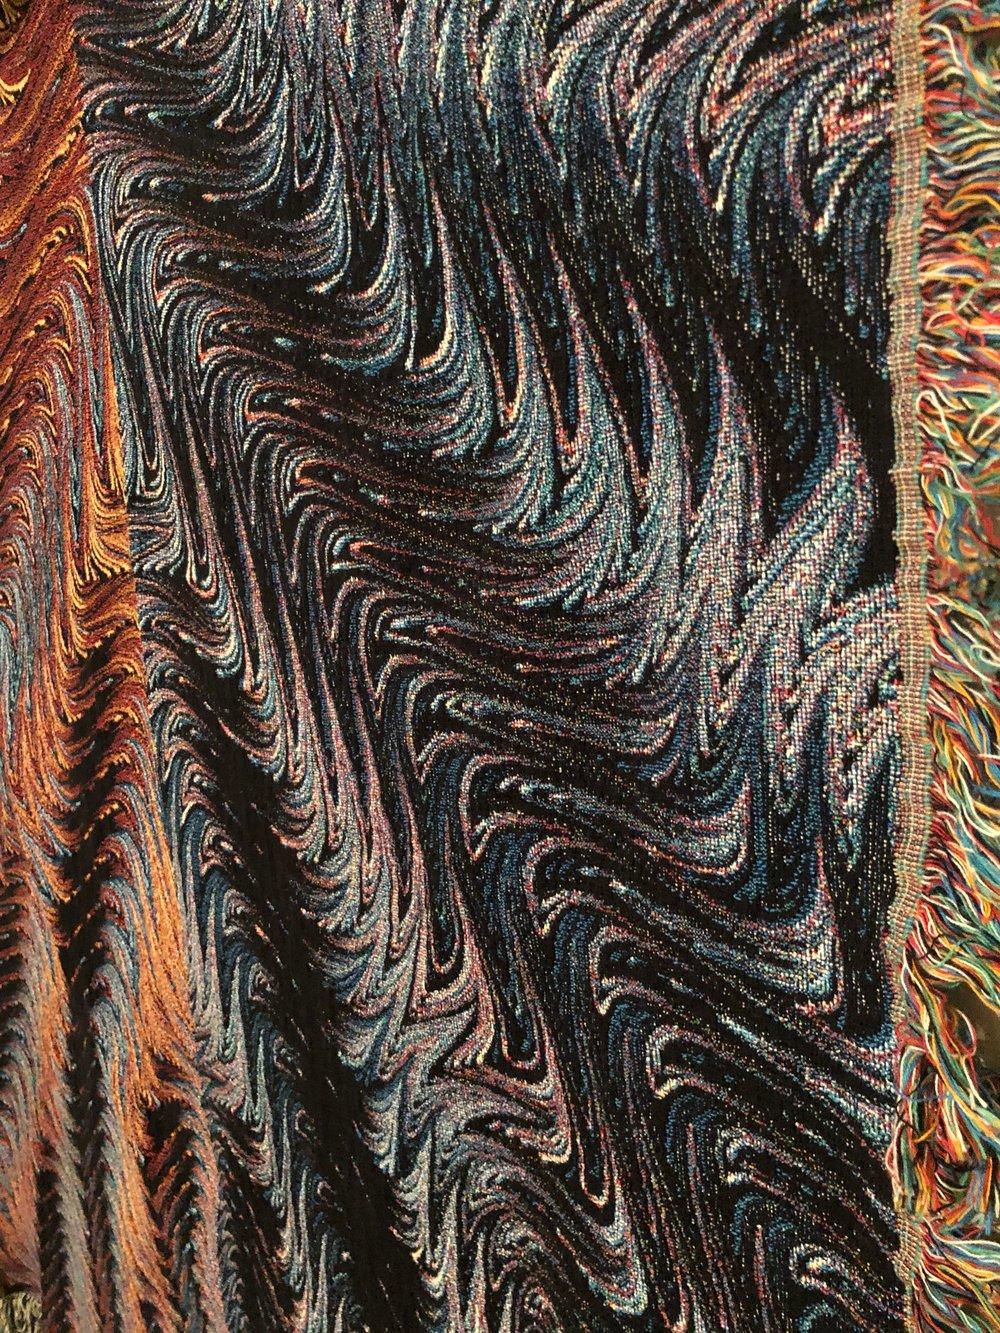 Woven Blanket #7